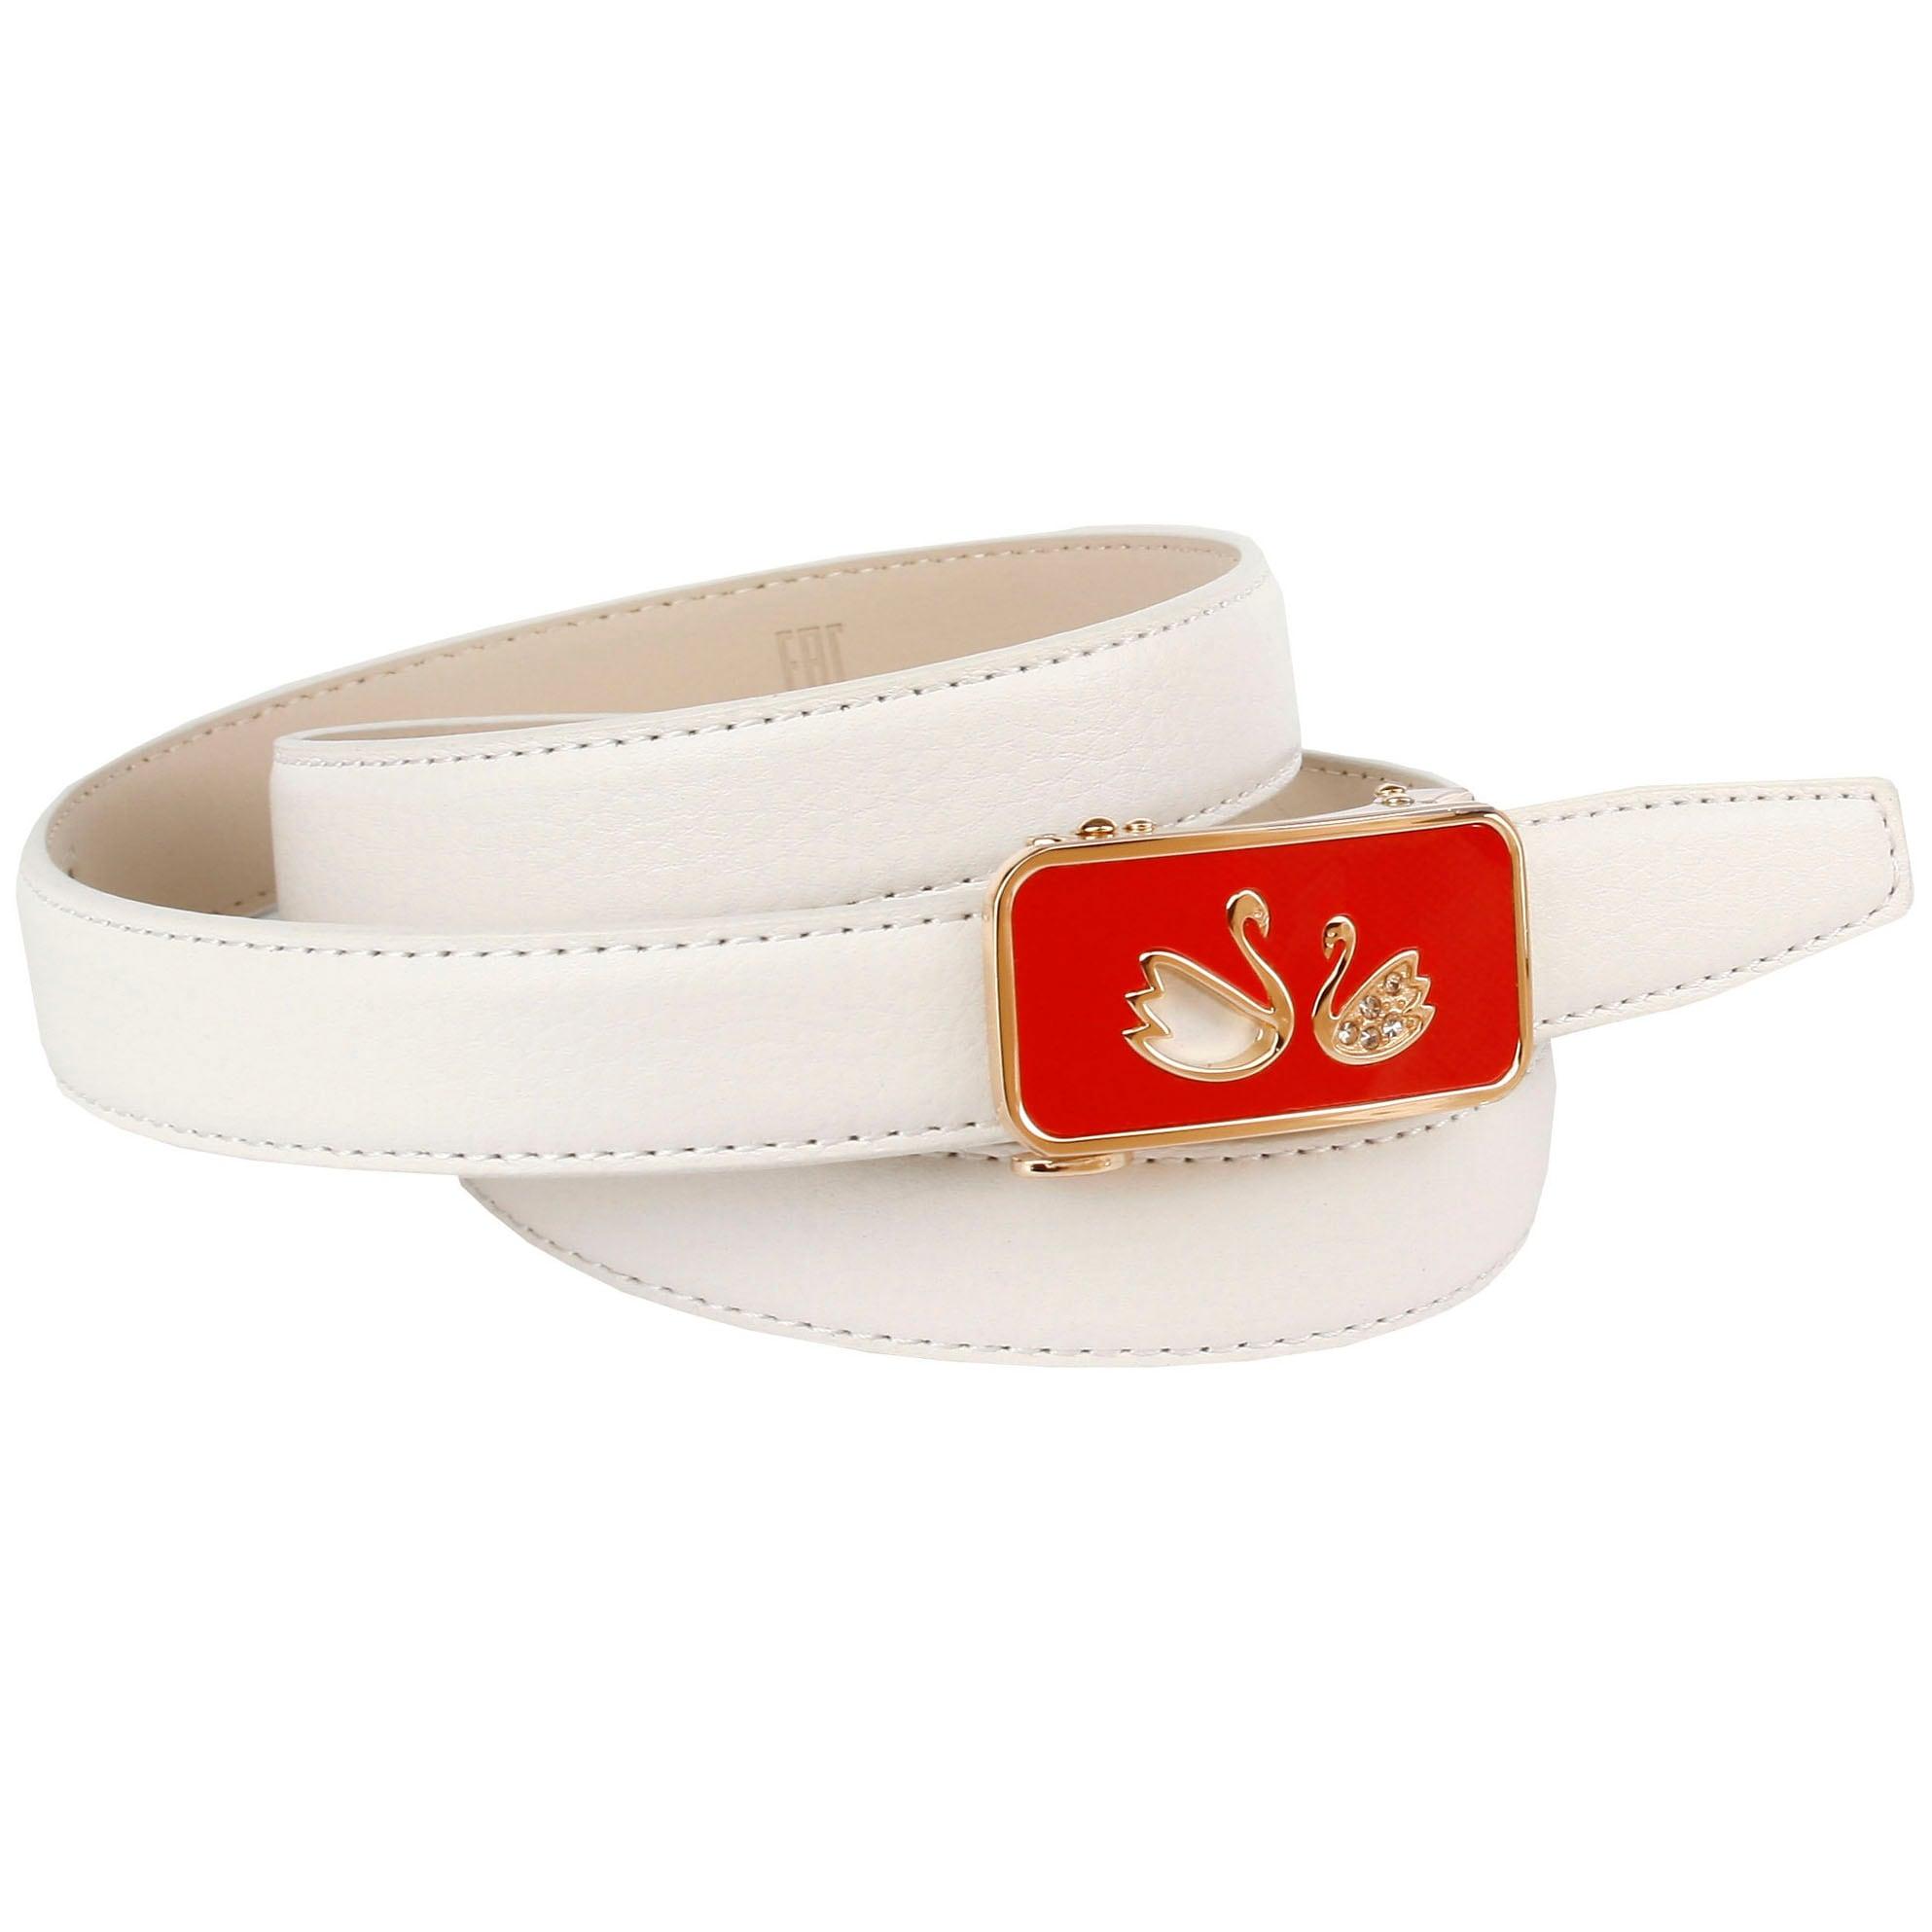 Anthoni Crown Ledergürtel, mit roter Schließe weiß Damen Ledergürtel Gürtel Accessoires